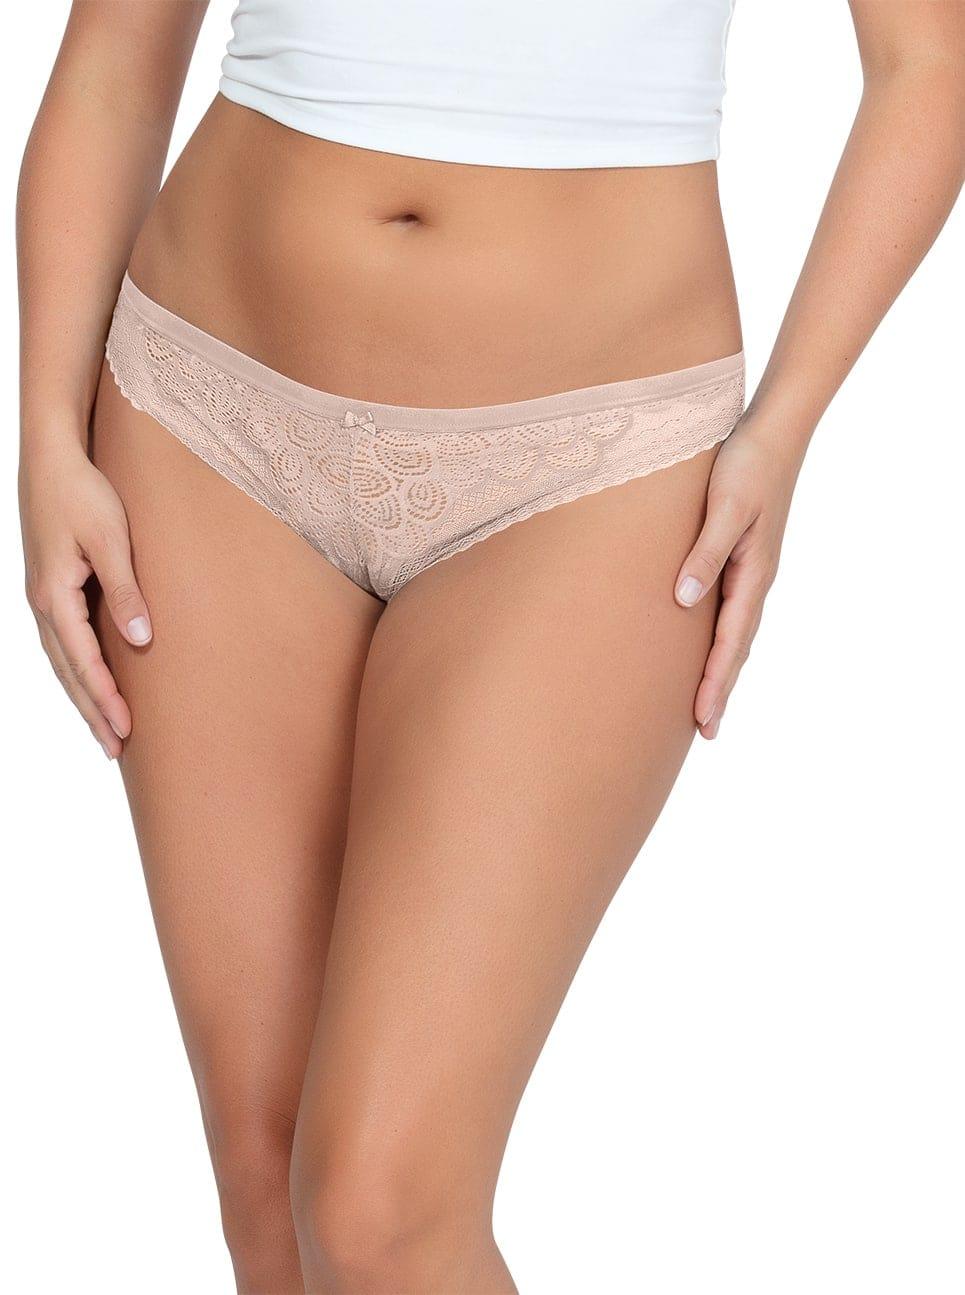 PARFAIT ParfaitPanty SoGlam ThongPP402 Bare Front - Parfait Panty So Glam Thong - Bare - PP402